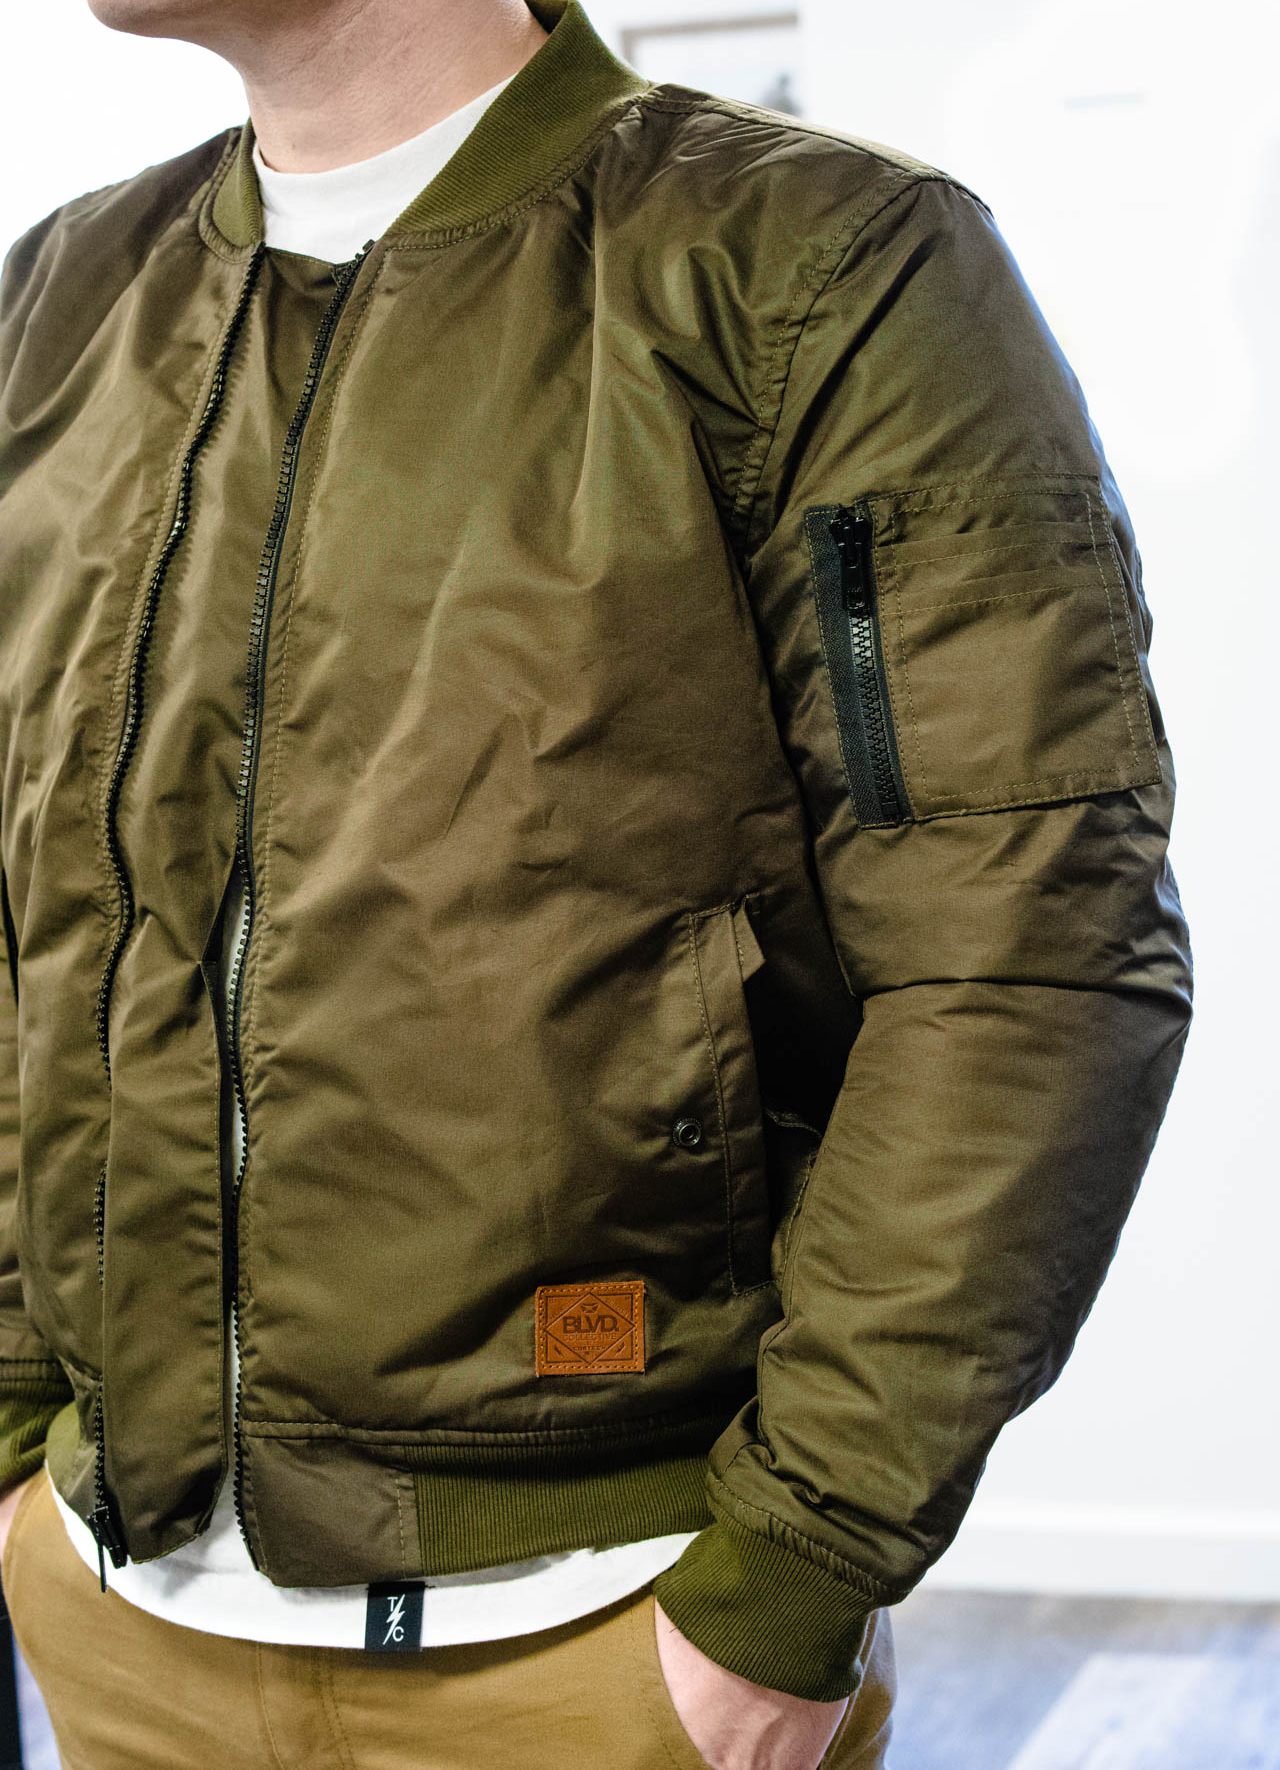 Cortec h Skipper Waterproof Bomber Jacket - Olive